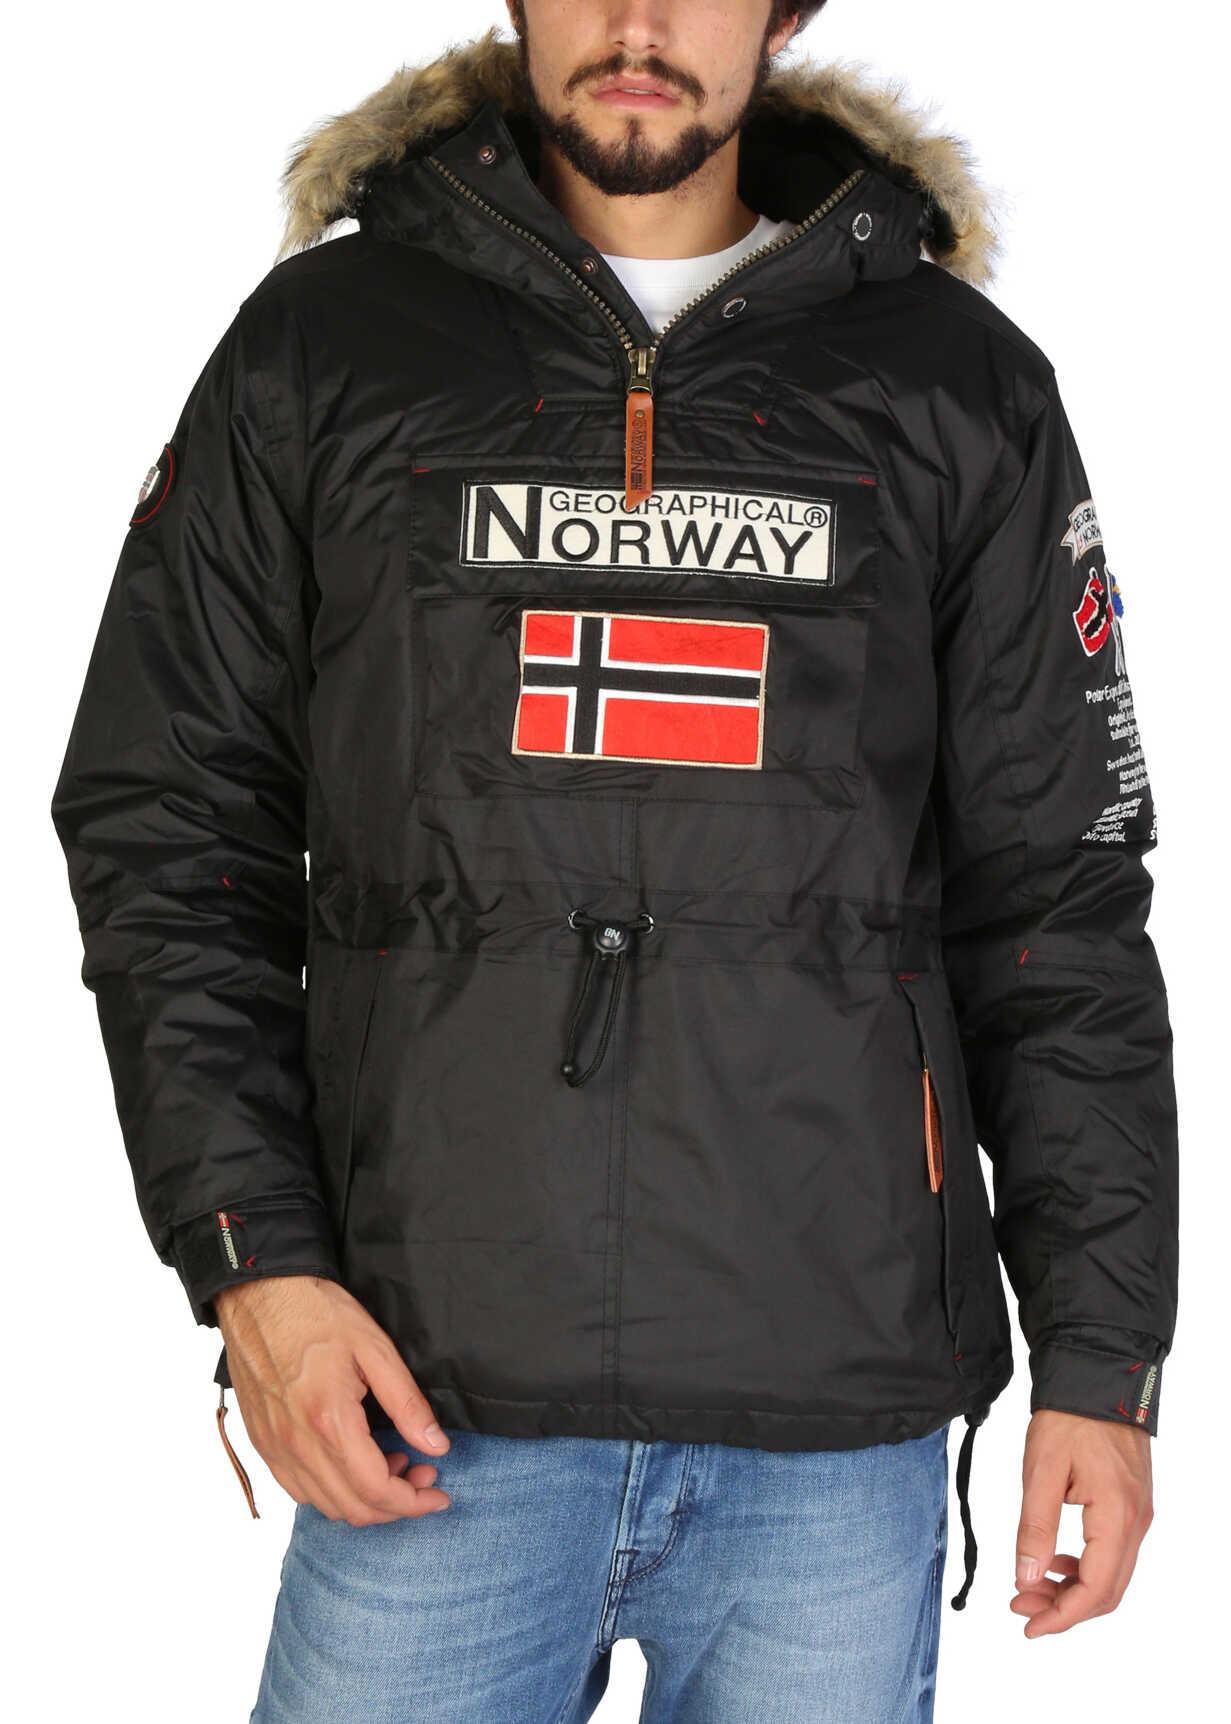 Geographical Norway Boomerang_Man Black